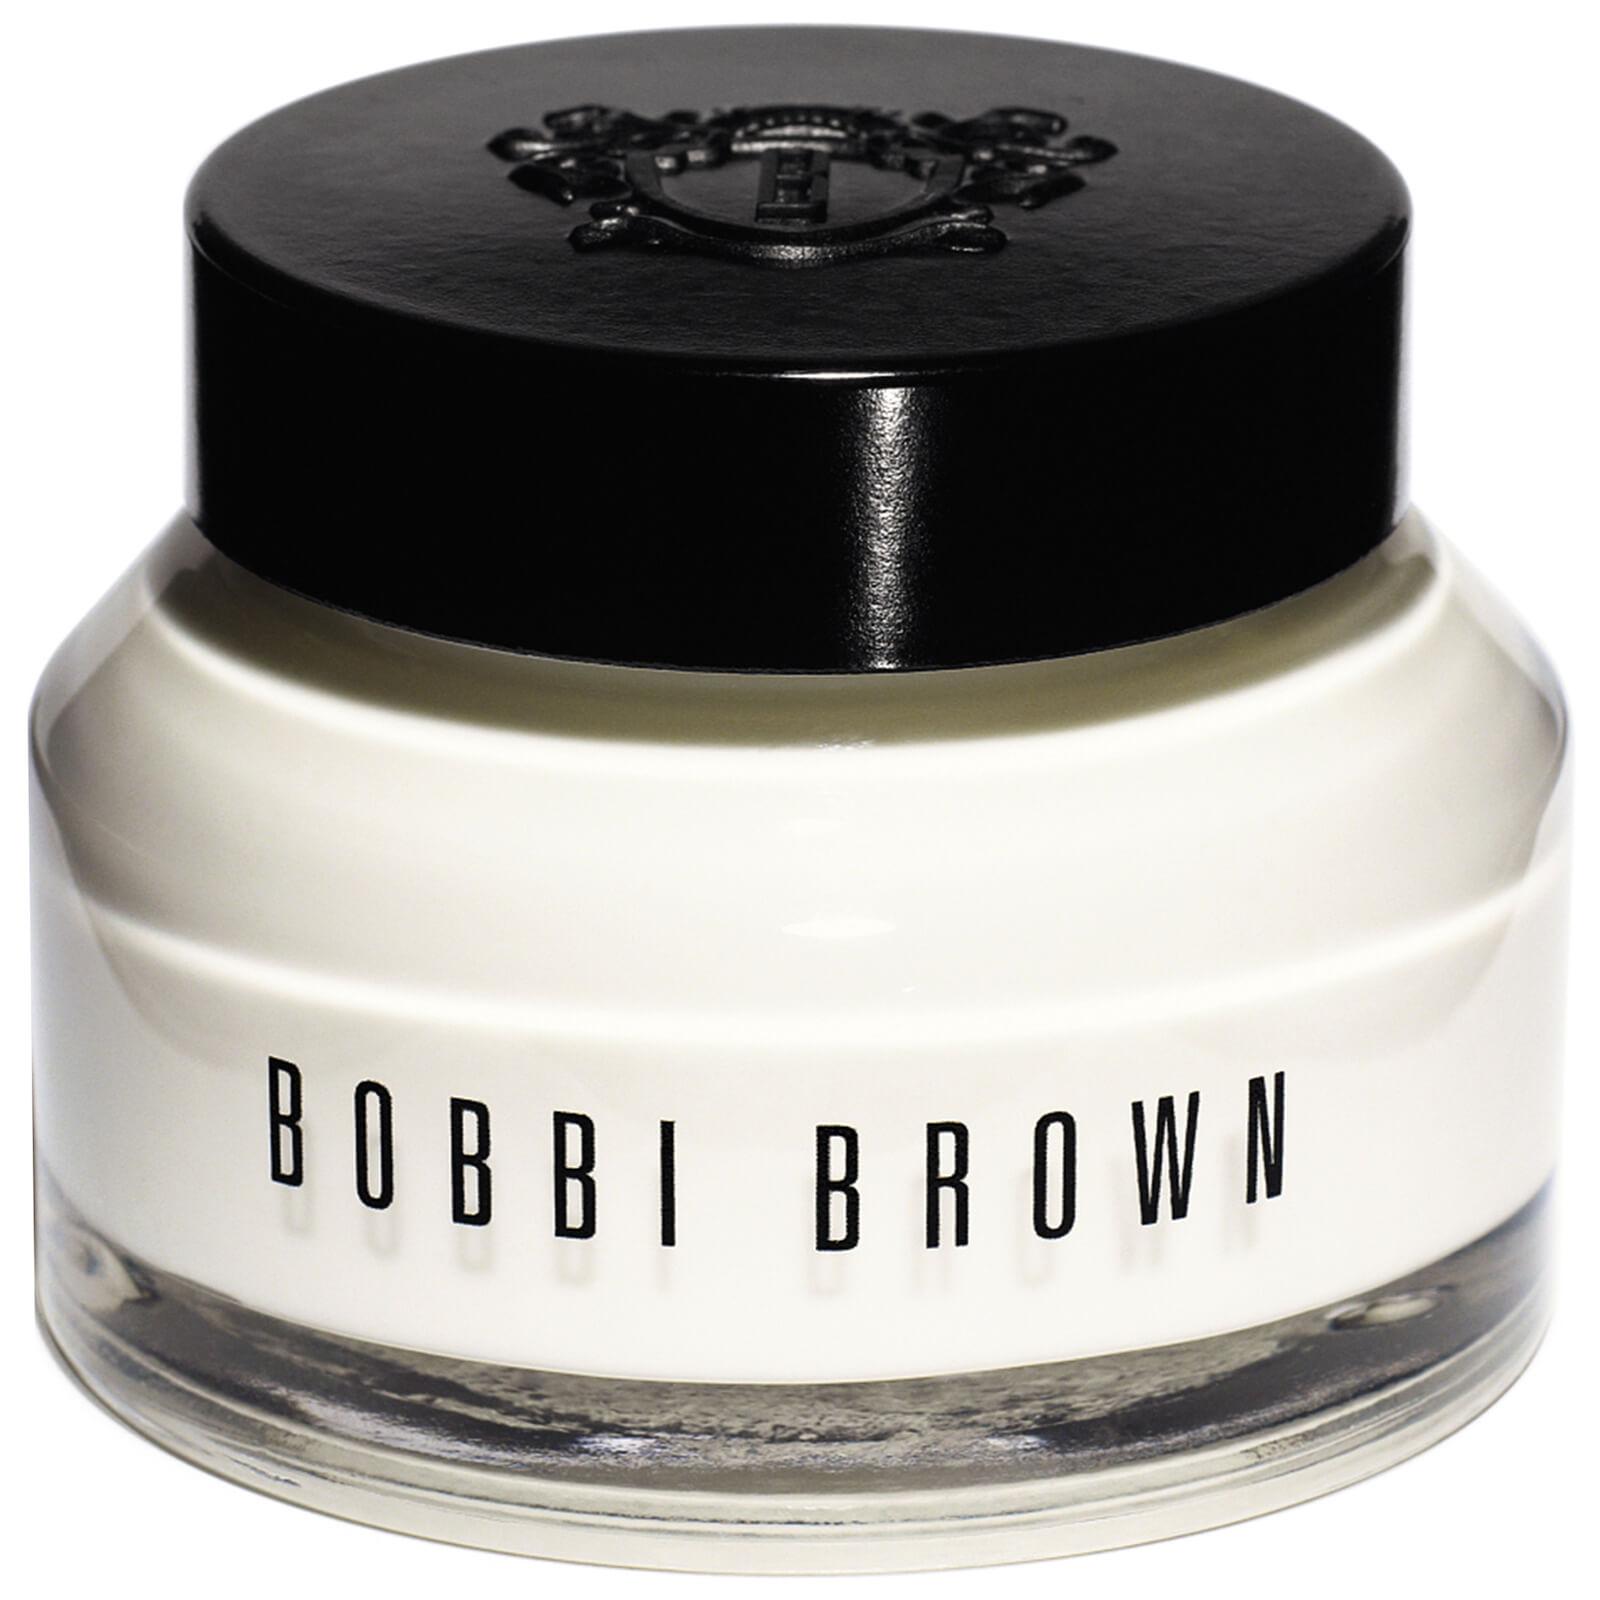 Healing facial cream like bobby browns